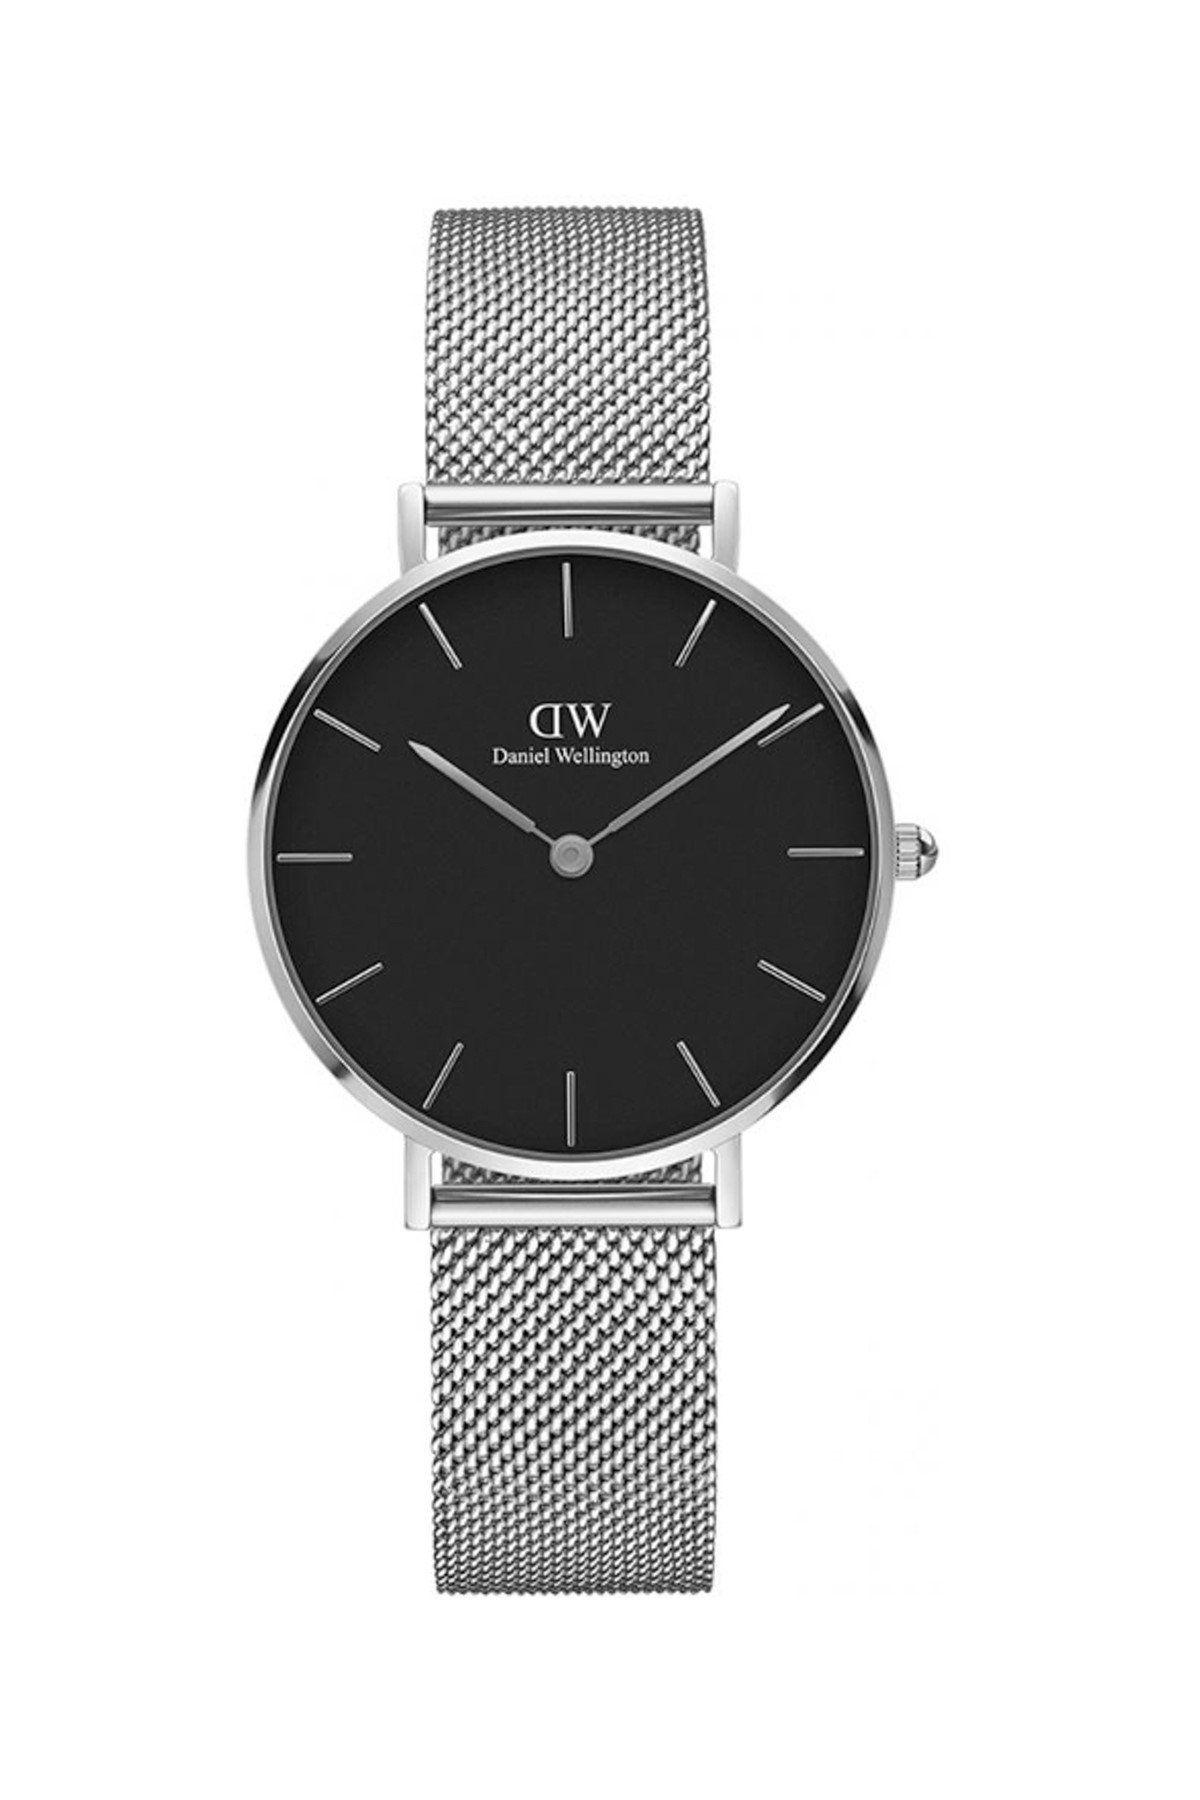 ca9034afabd Kadın Kol Saati Daniel Wellington   Trendyol - 379 TL   watches in ...